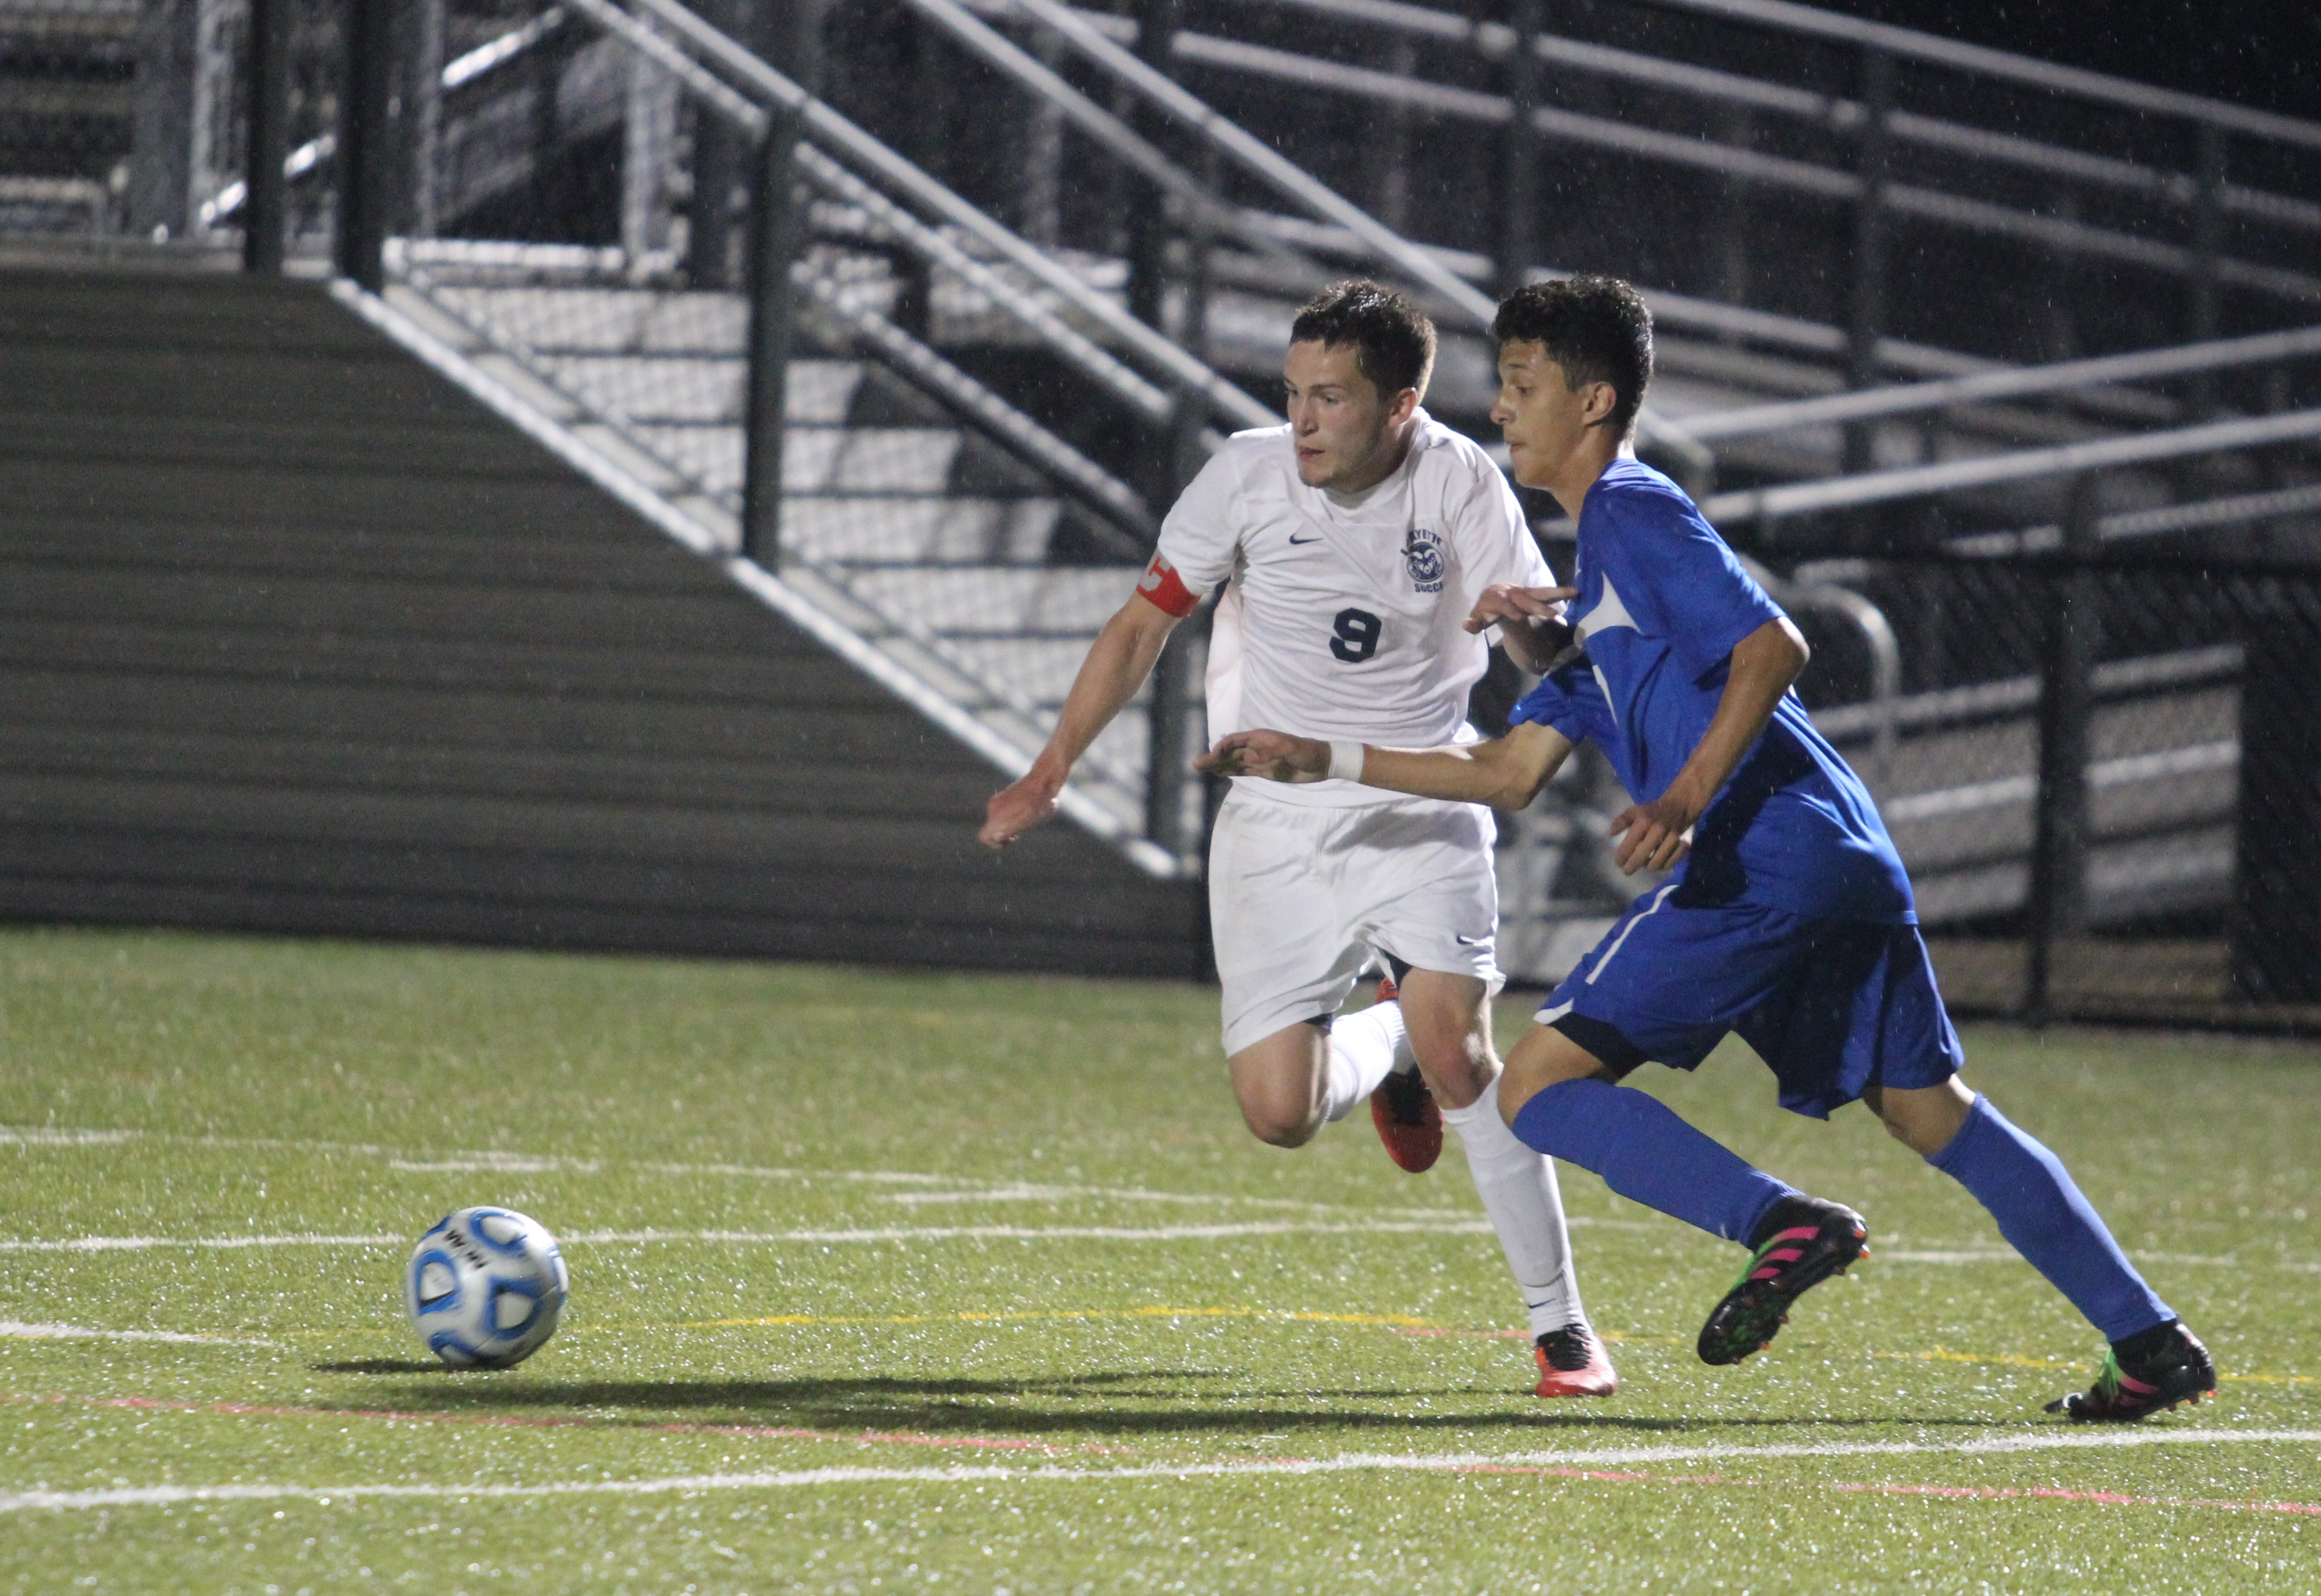 Boys Soccer Roundup: Lafayette, Tabb Play to Scoreless Draw